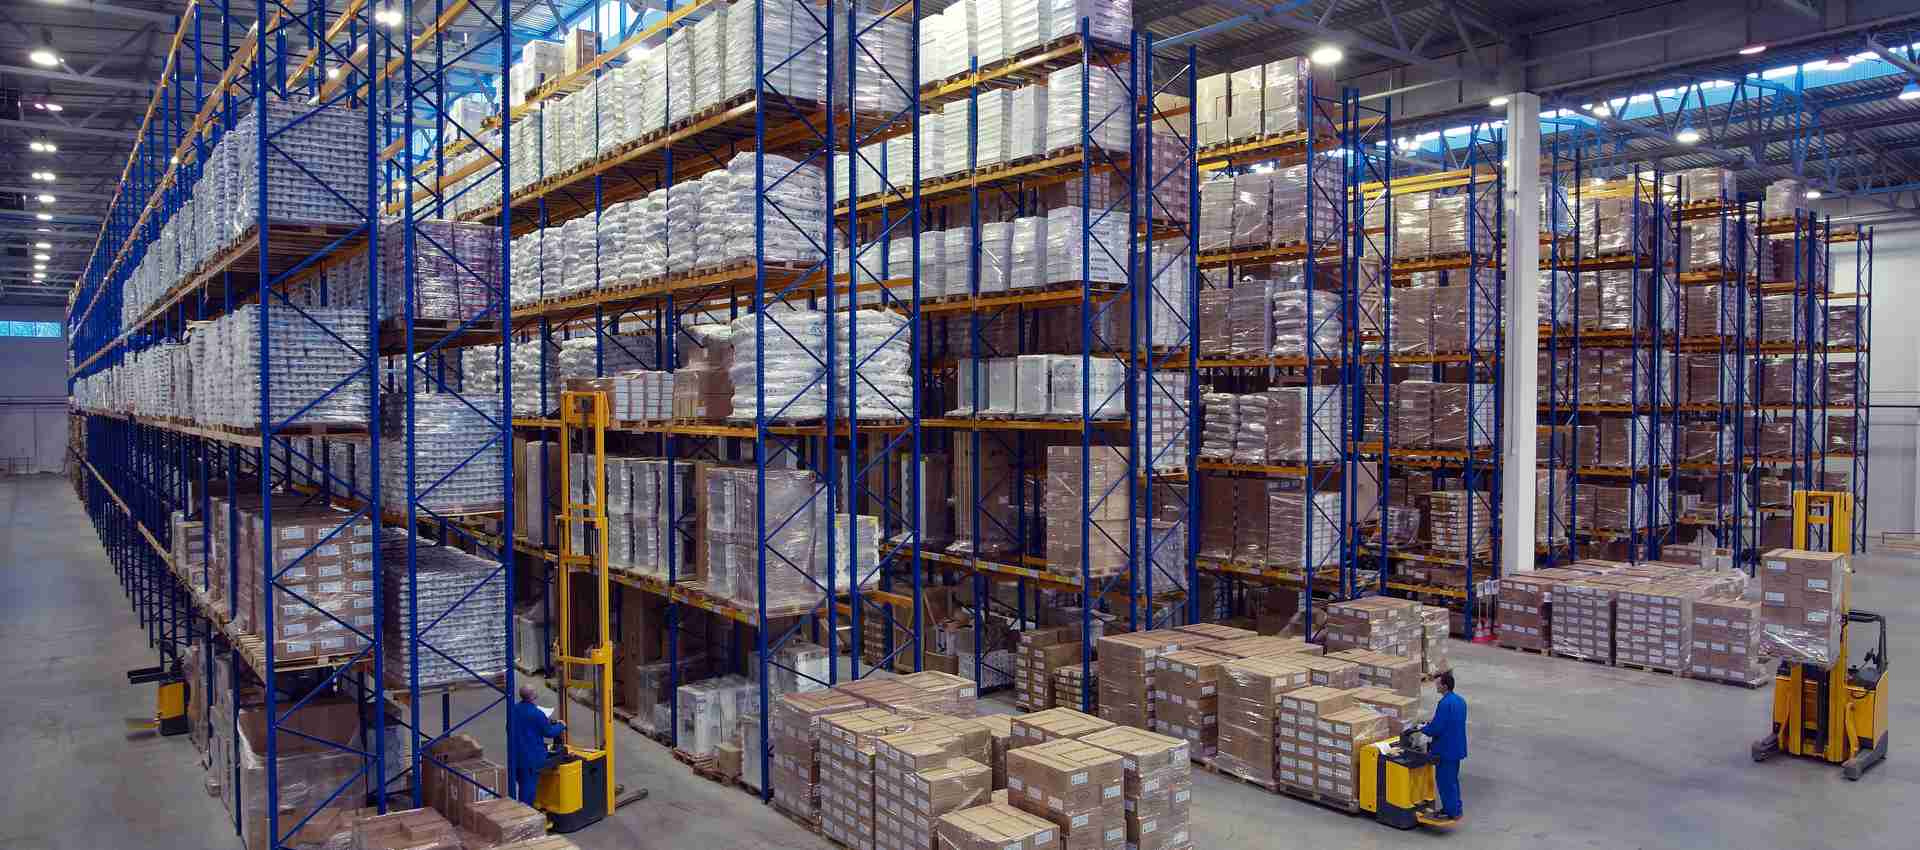 Warehouse Operations: Optimizing the Storage Process